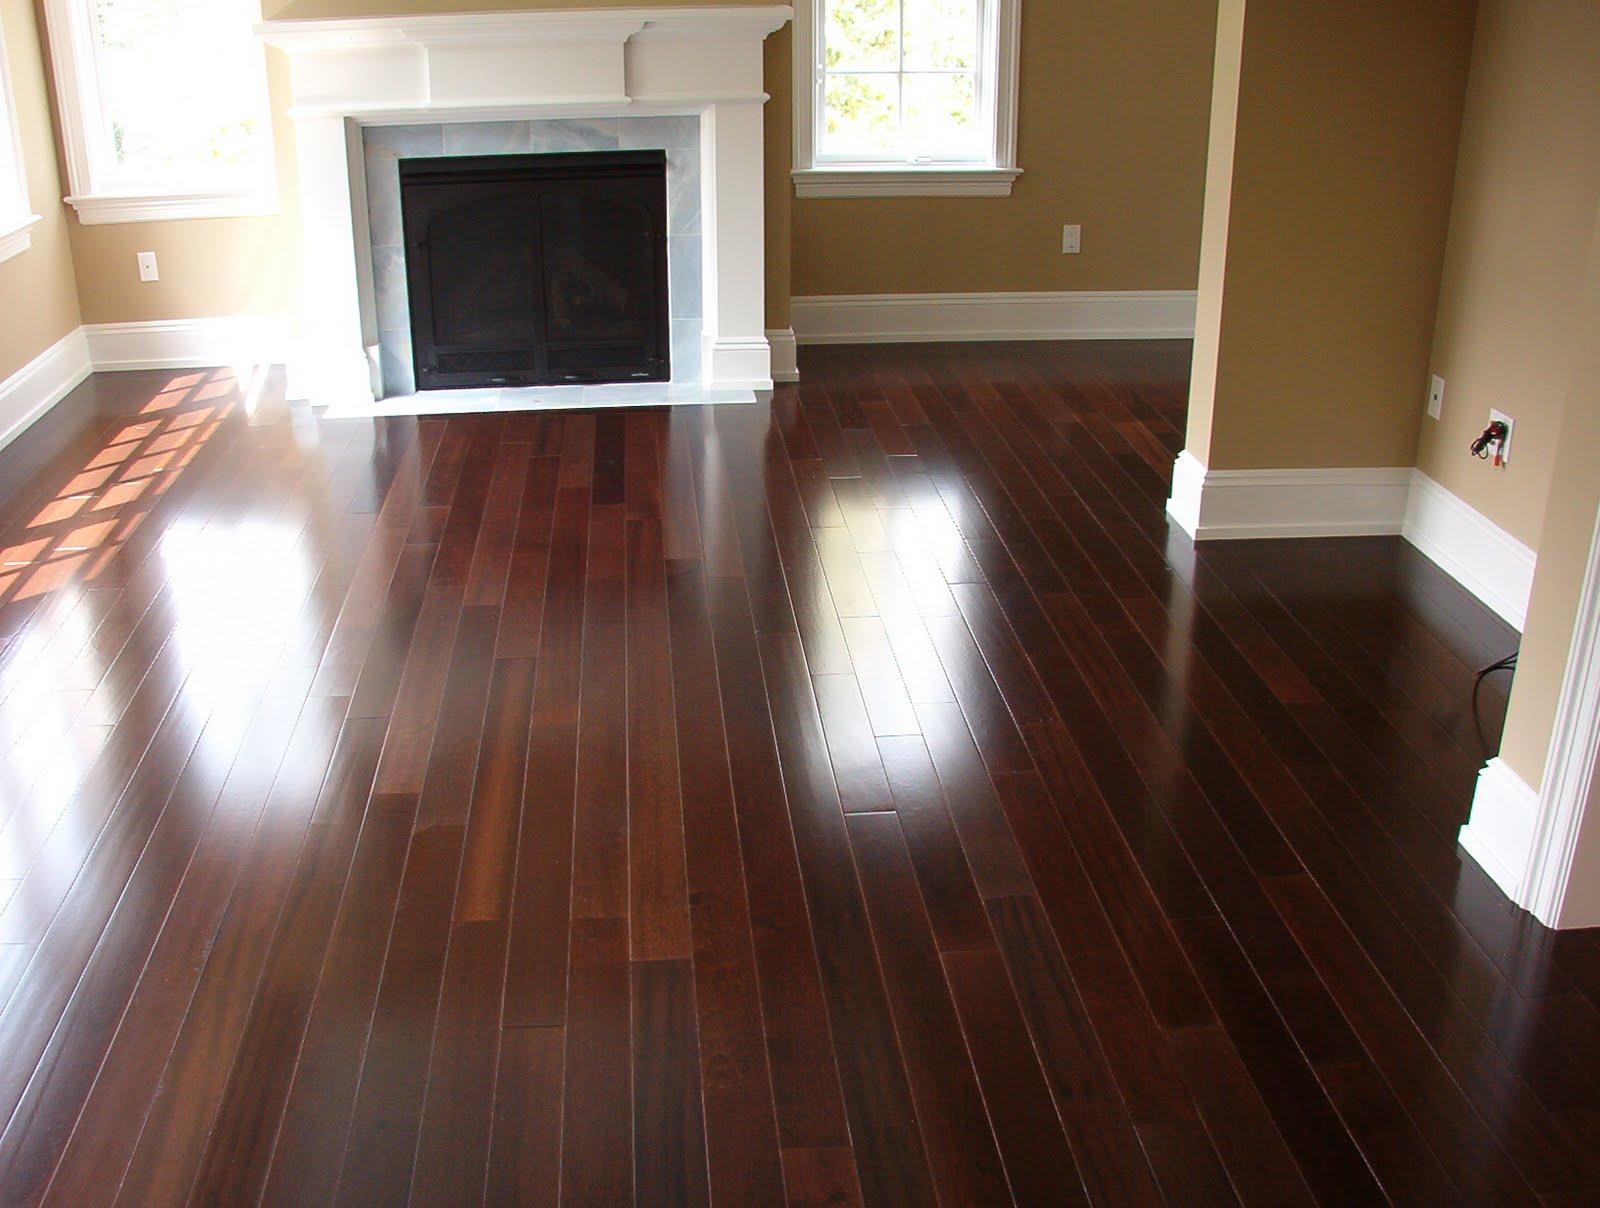 Applegate Wood Floors Blog July 2010